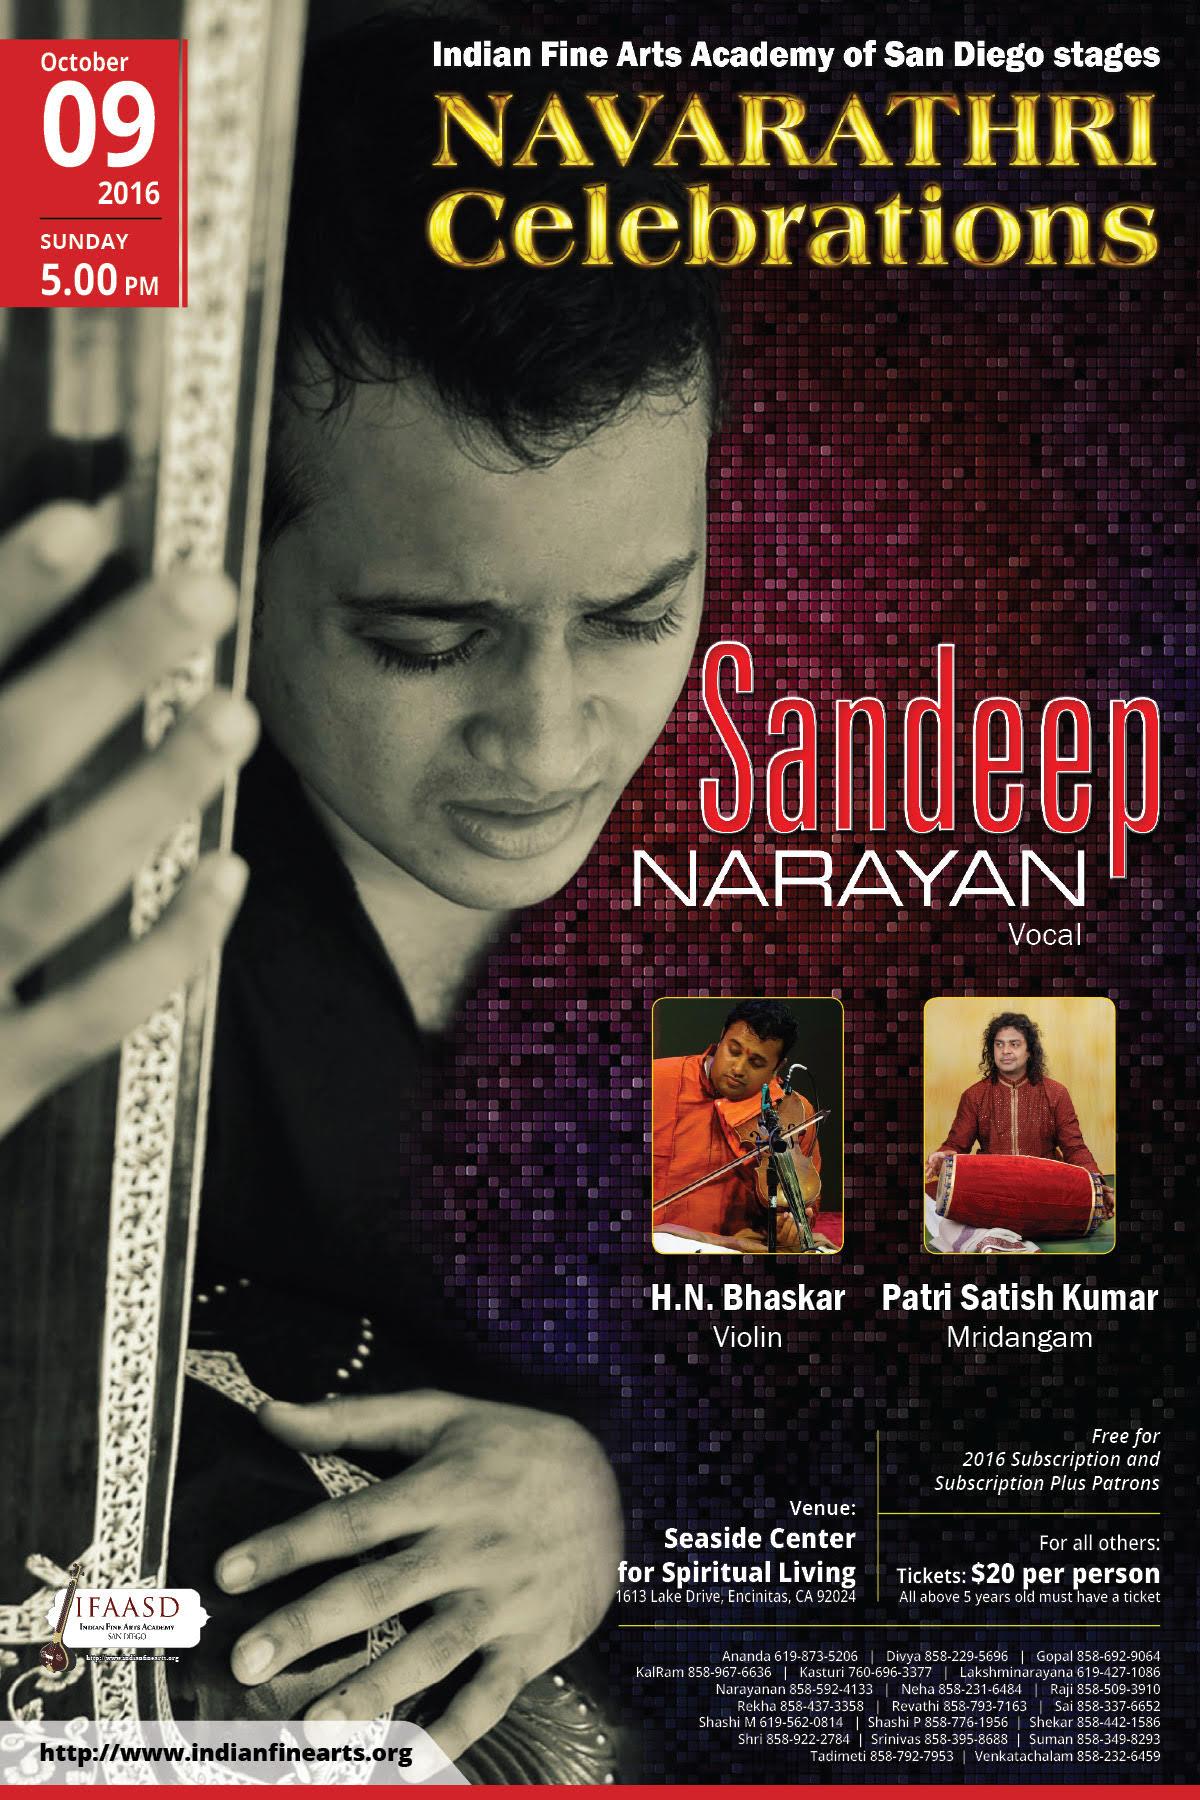 sandeepnarayan-sandiego-ca-oct2016